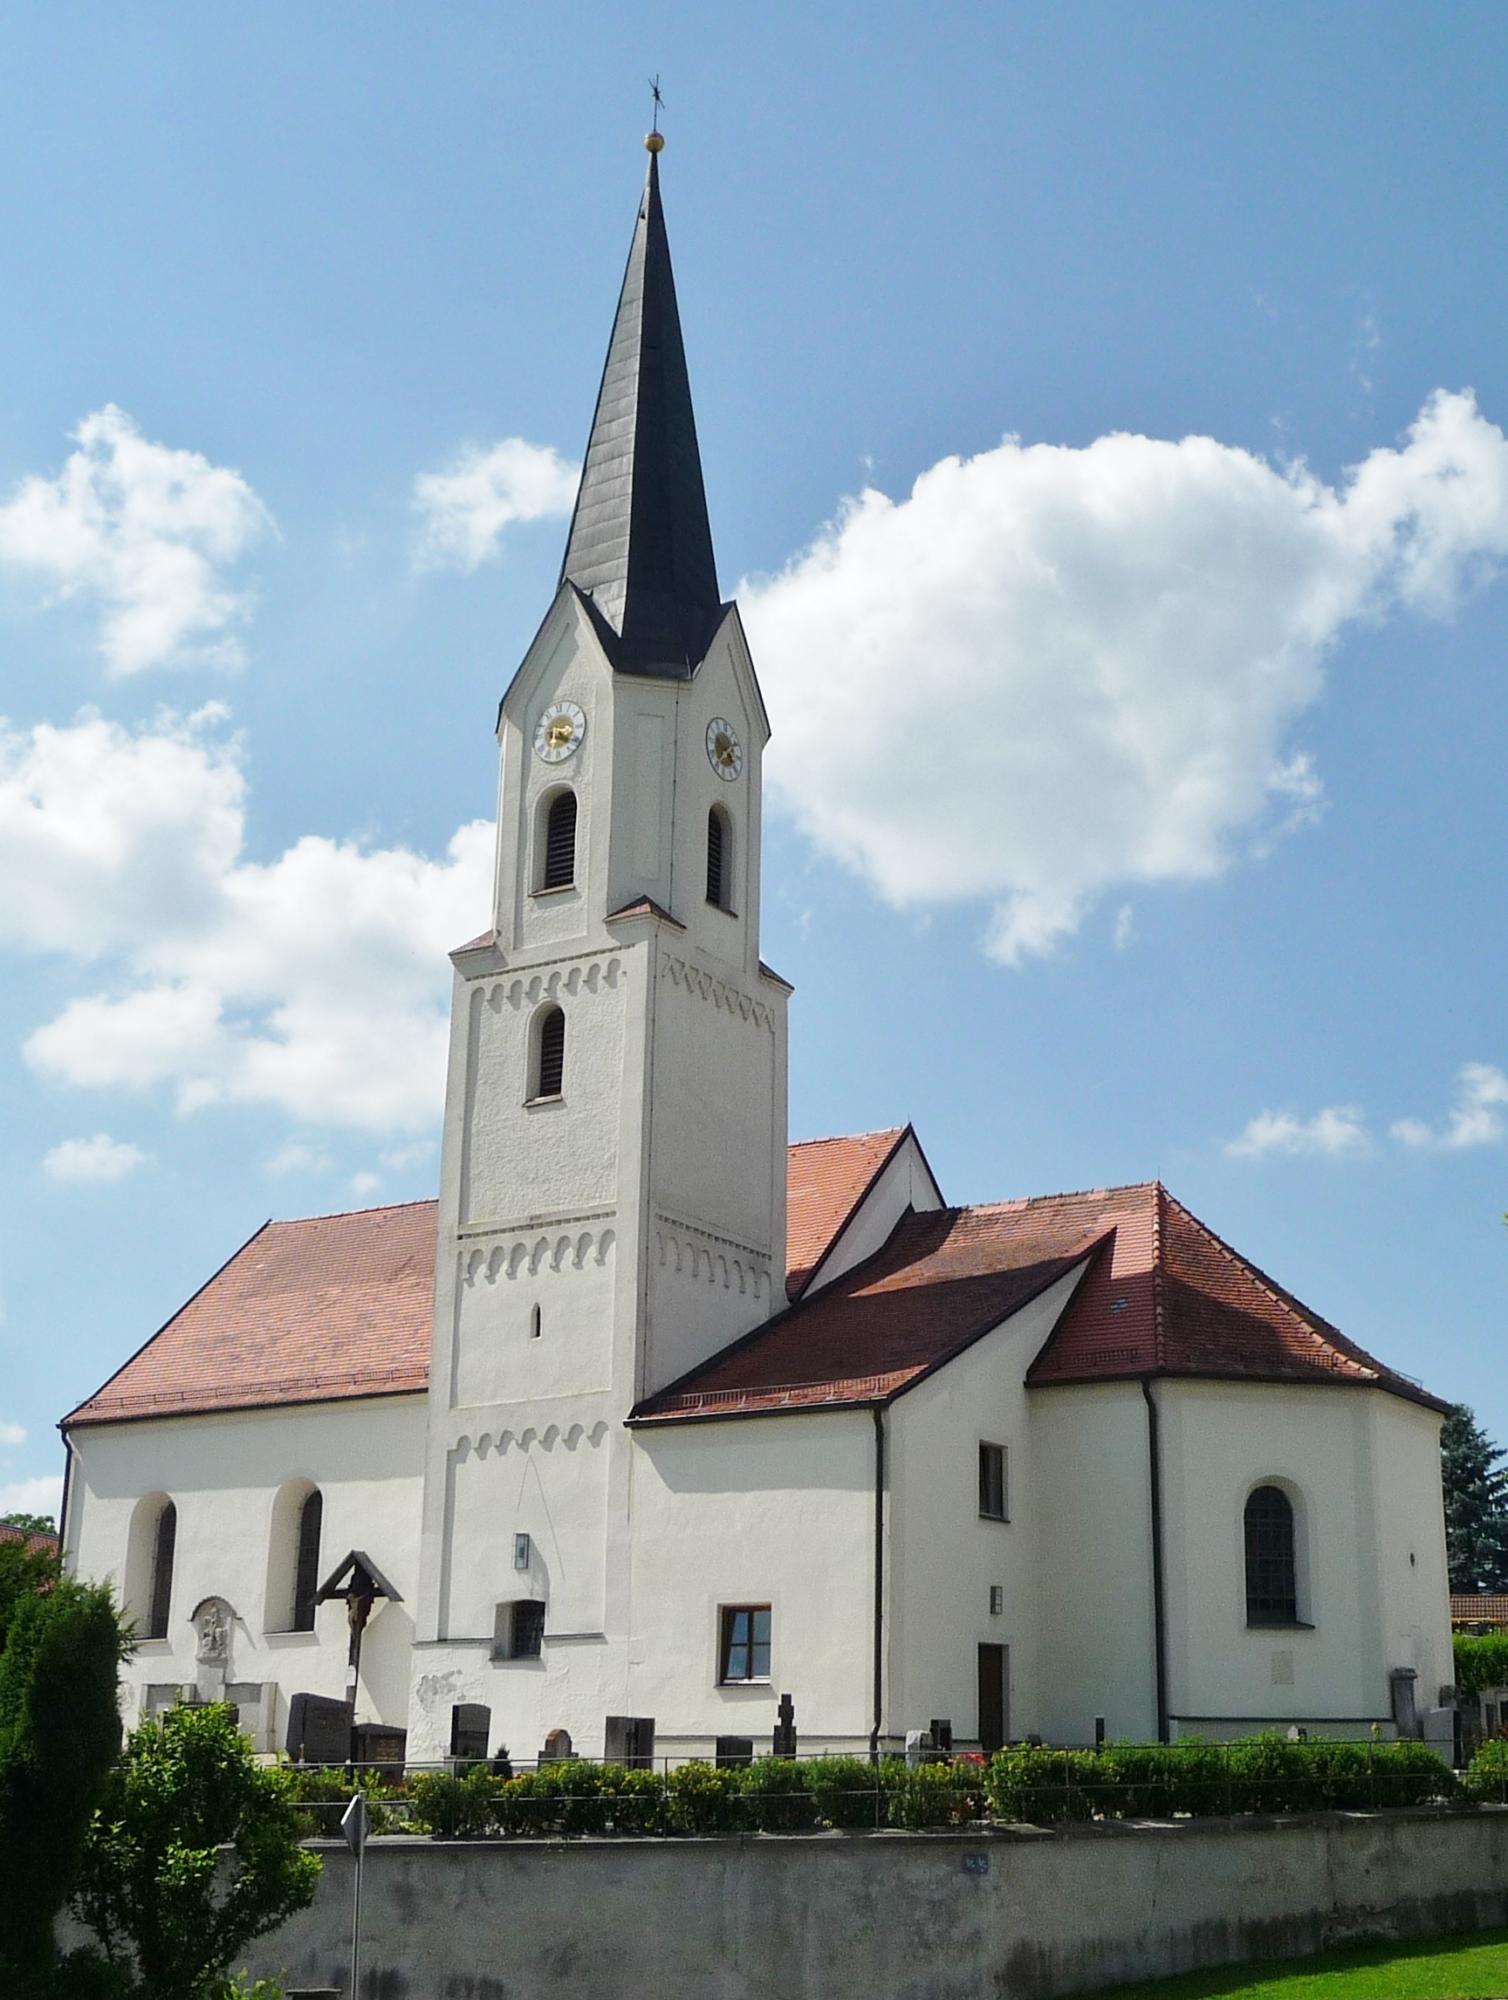 Pfarrkirche Kammern